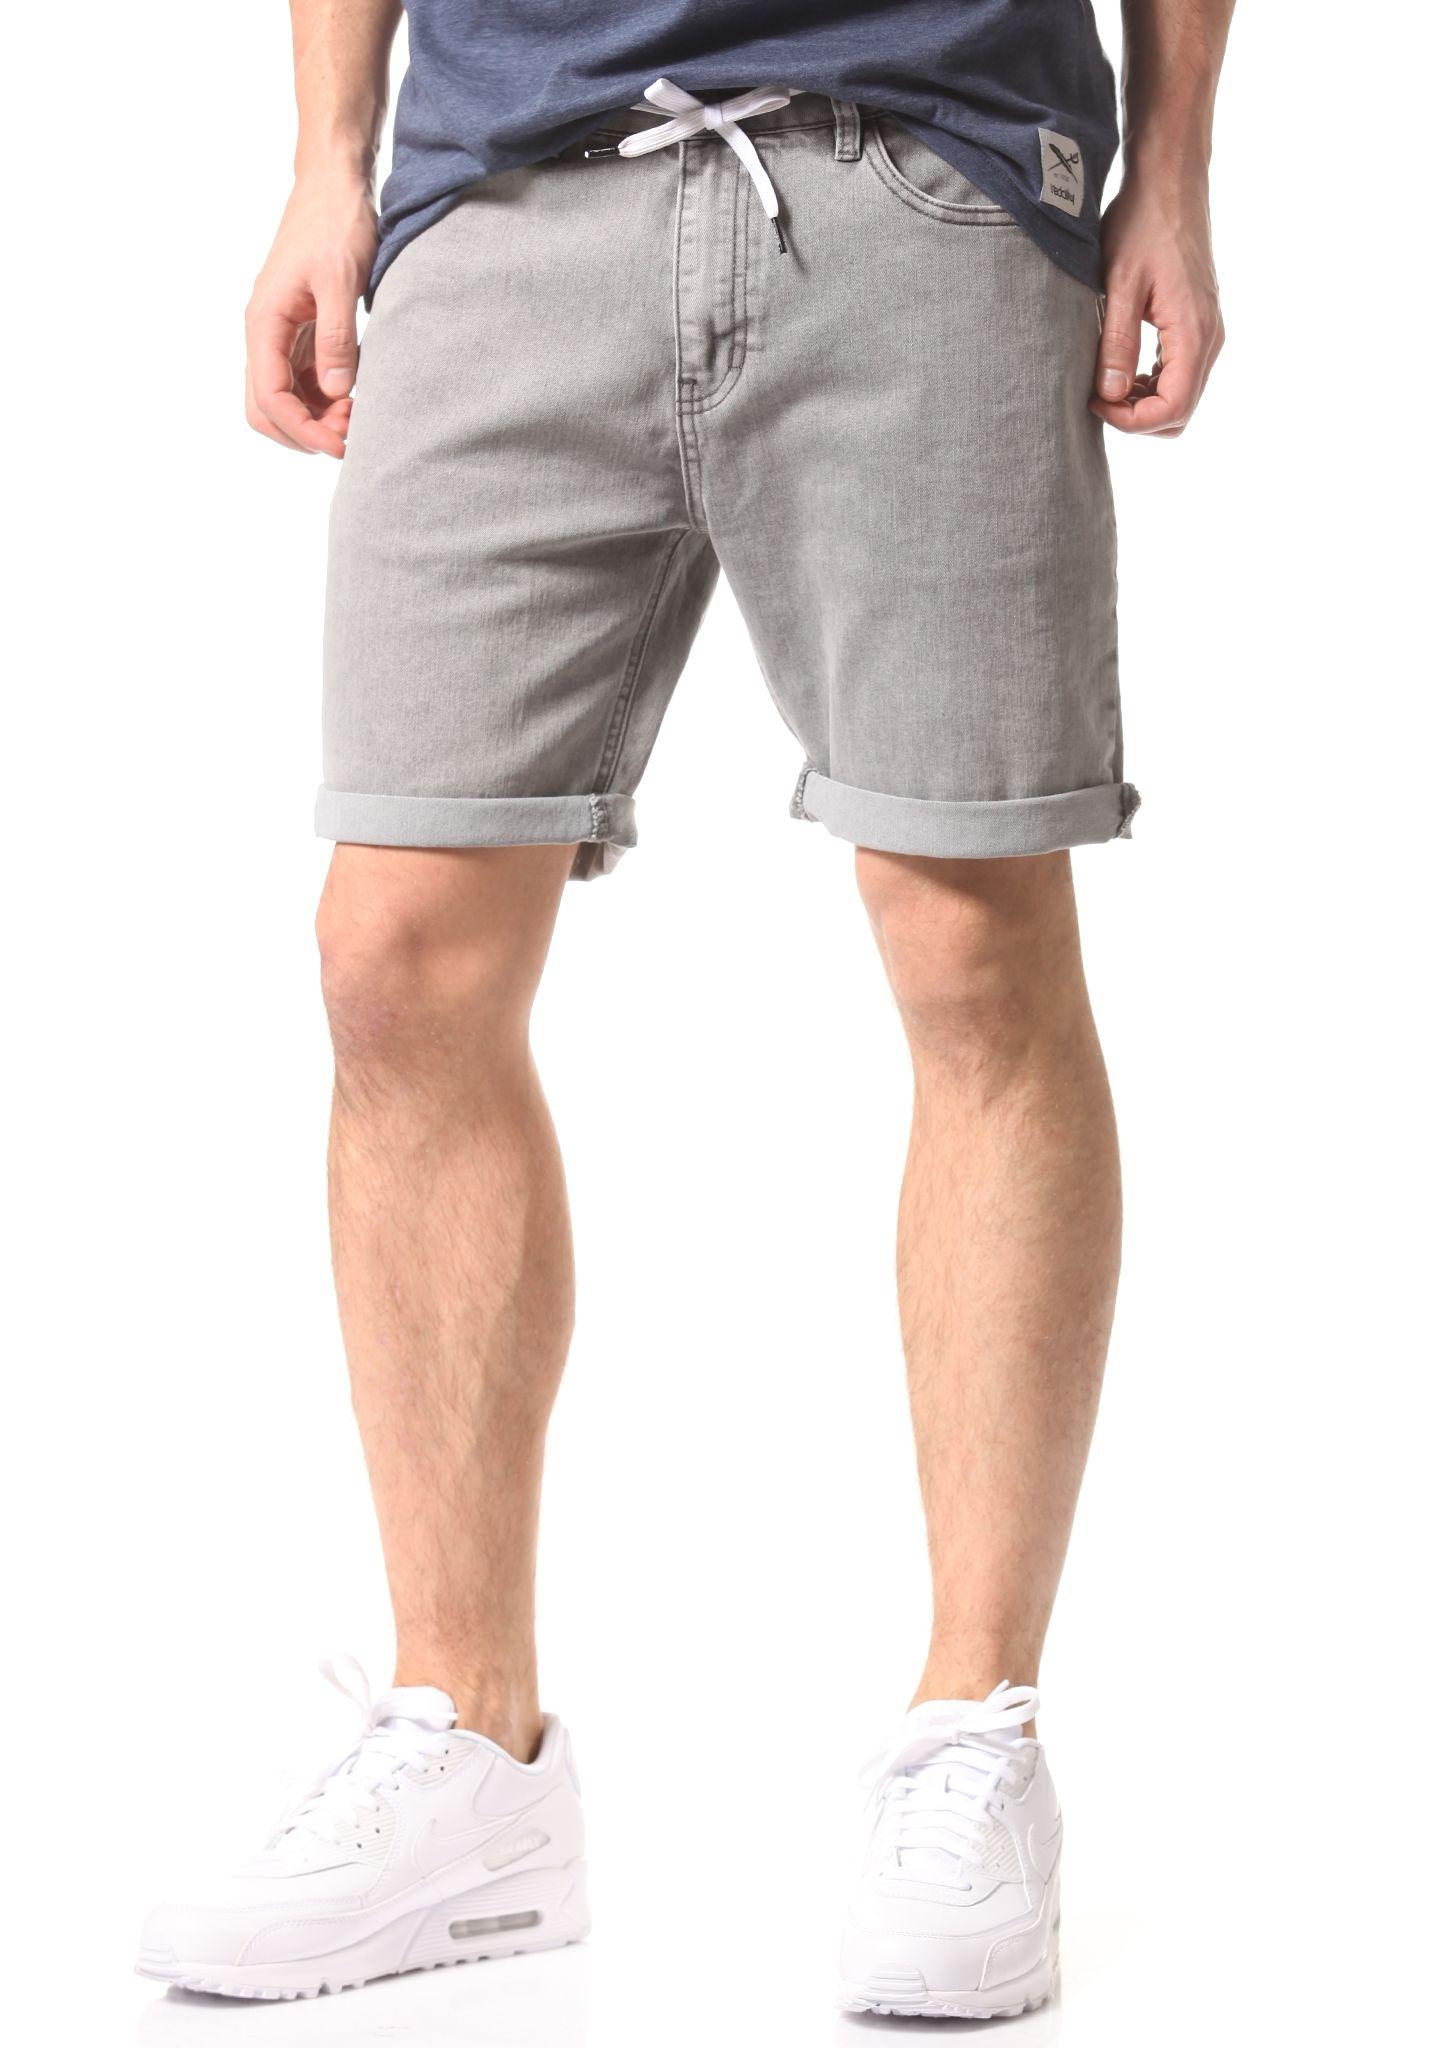 denim shorts for men iriedaily slim shot2 denim - shorts for men - grey - planet sports PCJOQZH